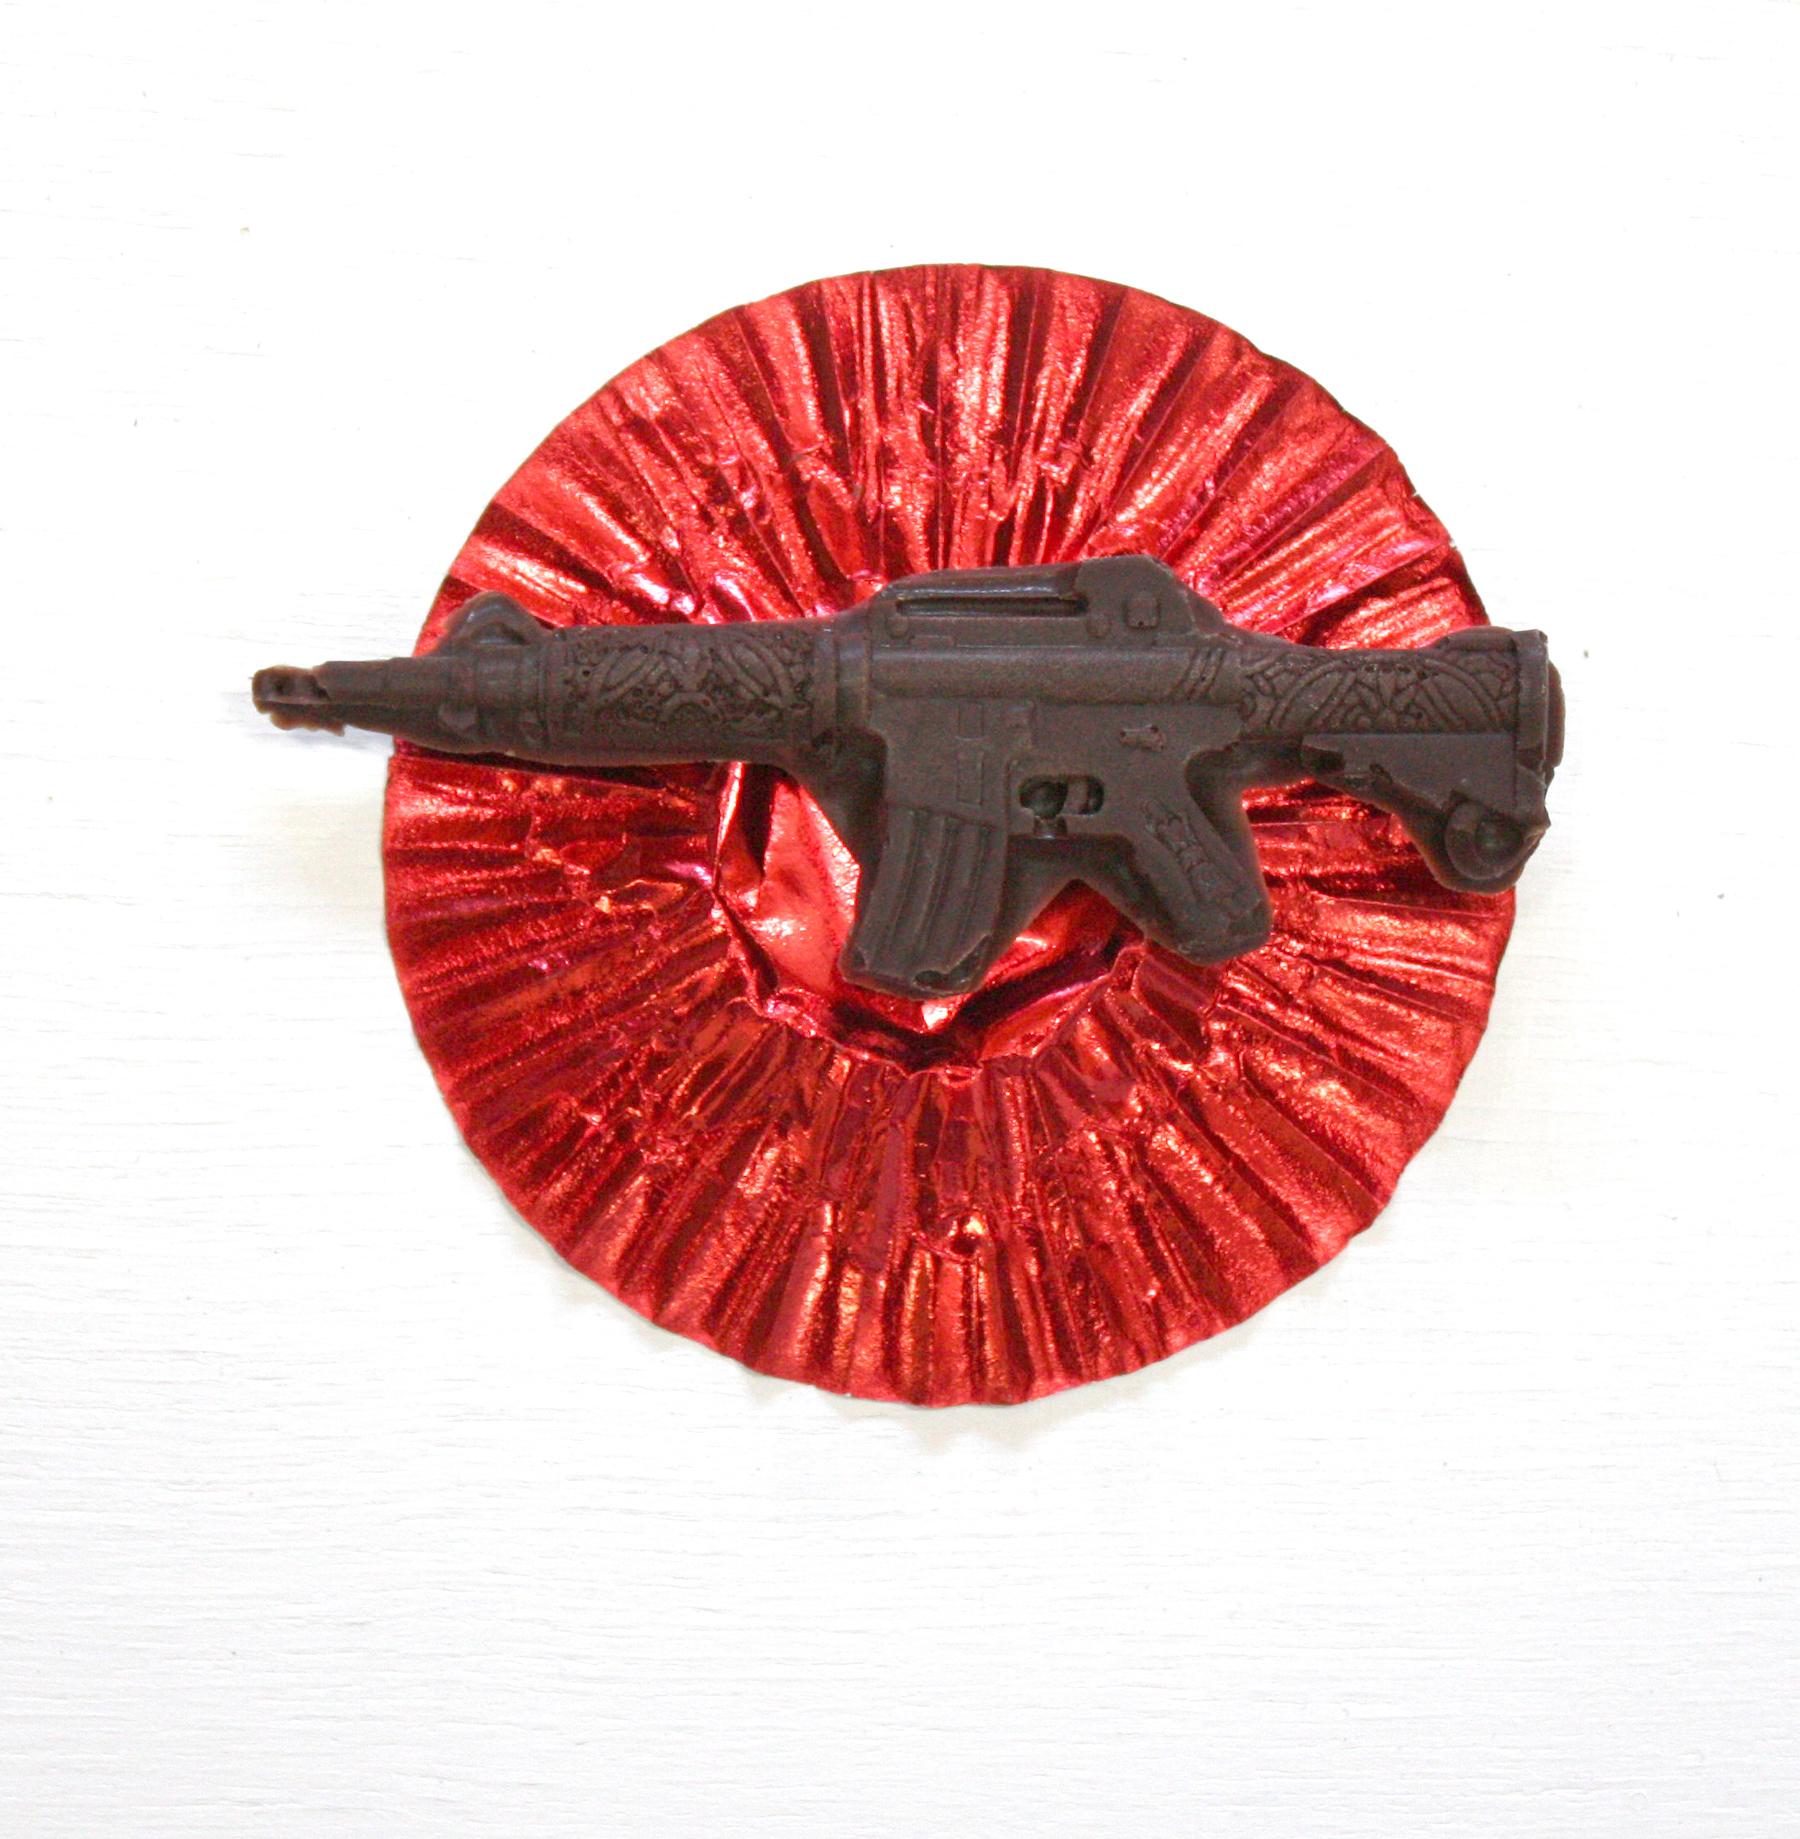 moya_devine_TANSTAAFL_detail_chocolate gun_2.jpg